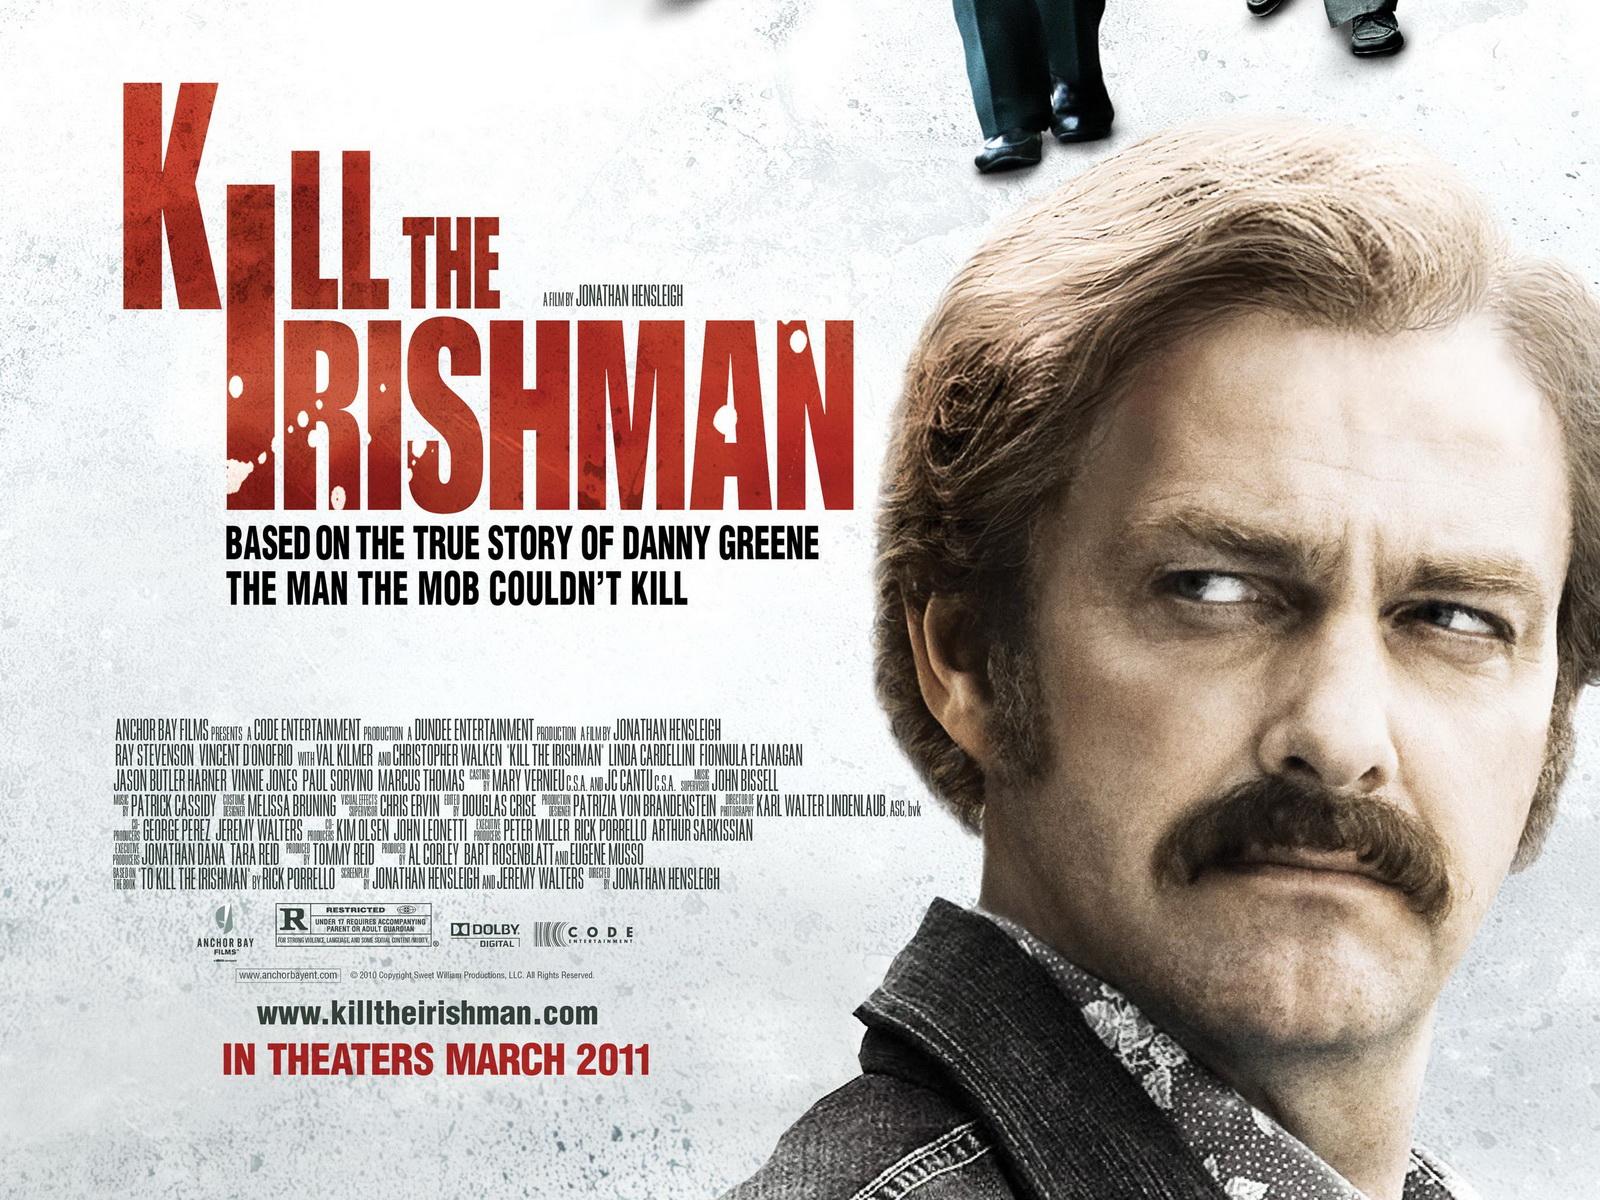 Kill the Irishman – Did You See That One?